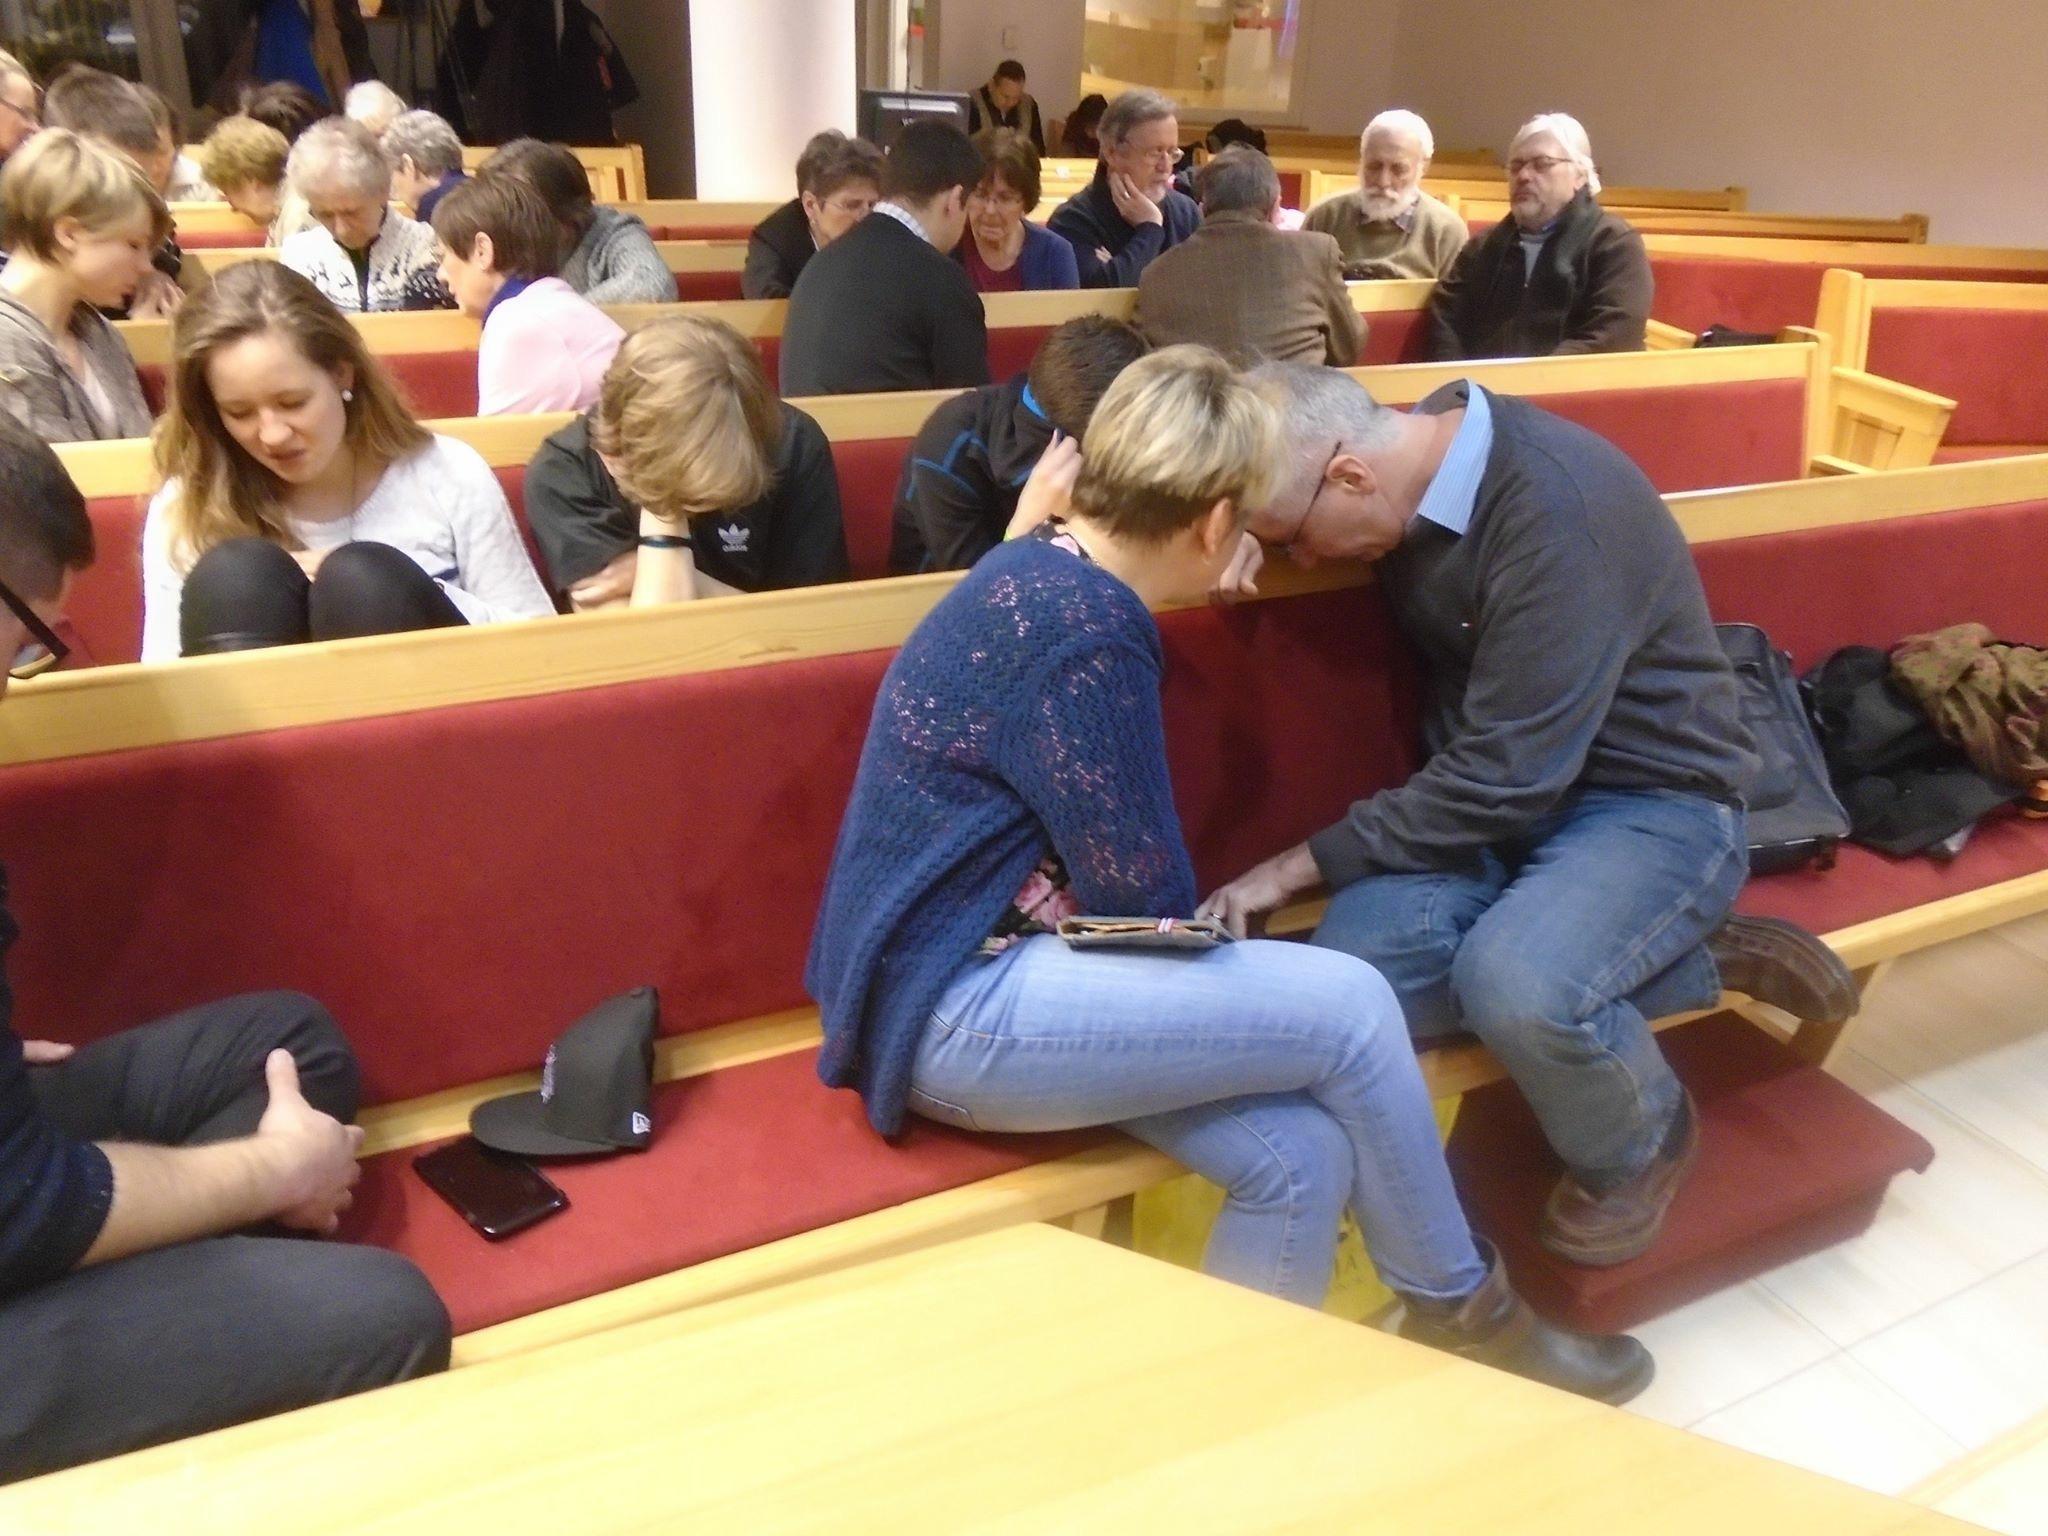 Prayer-event for the release of Andrew Brunson